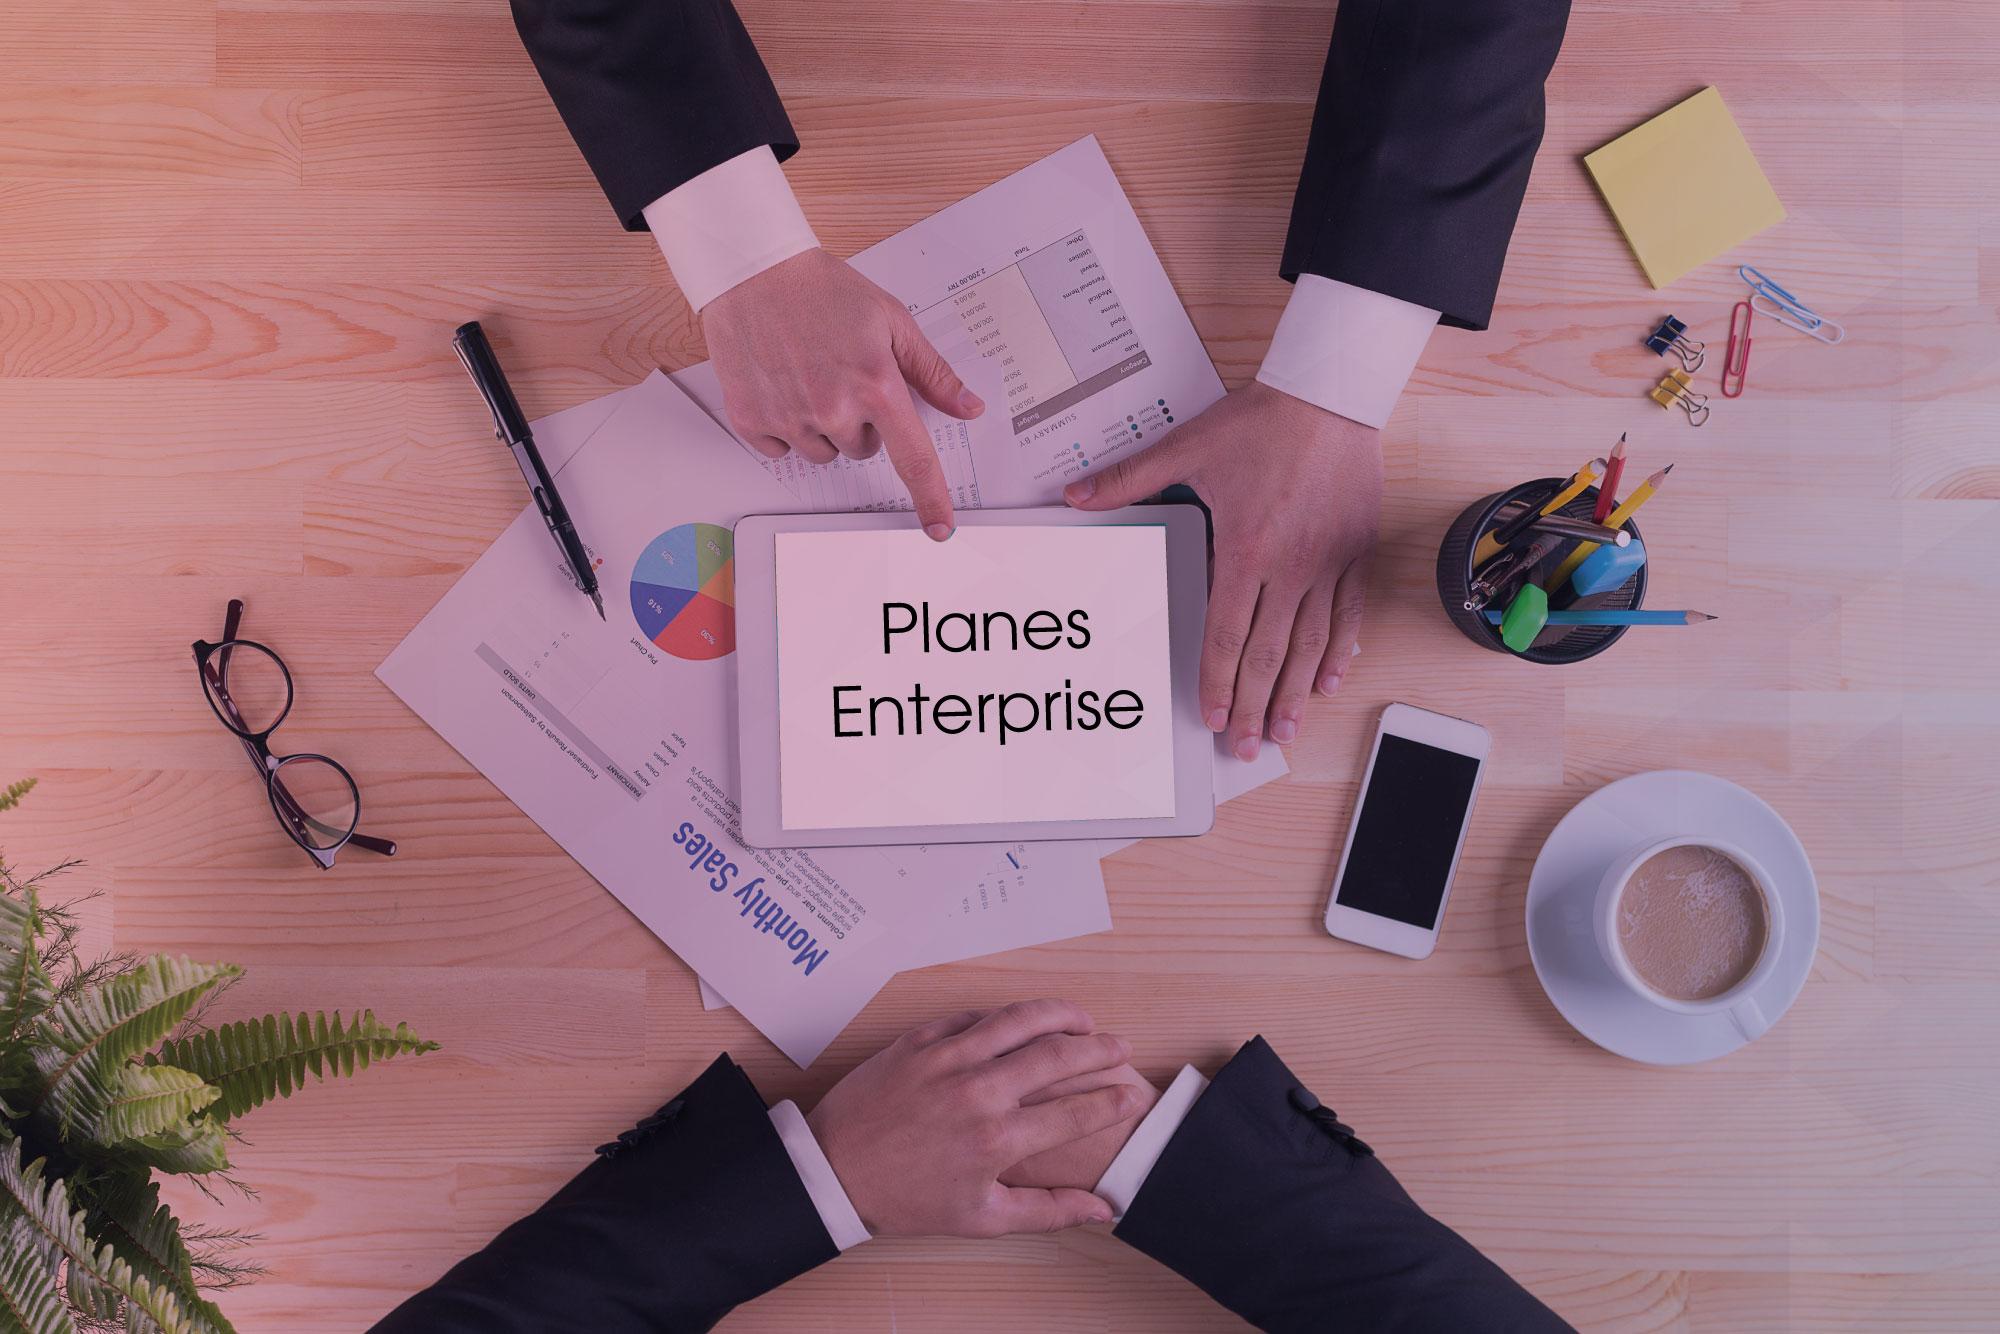 Planes Enterprise Inbound Marketing Innovación Comercial